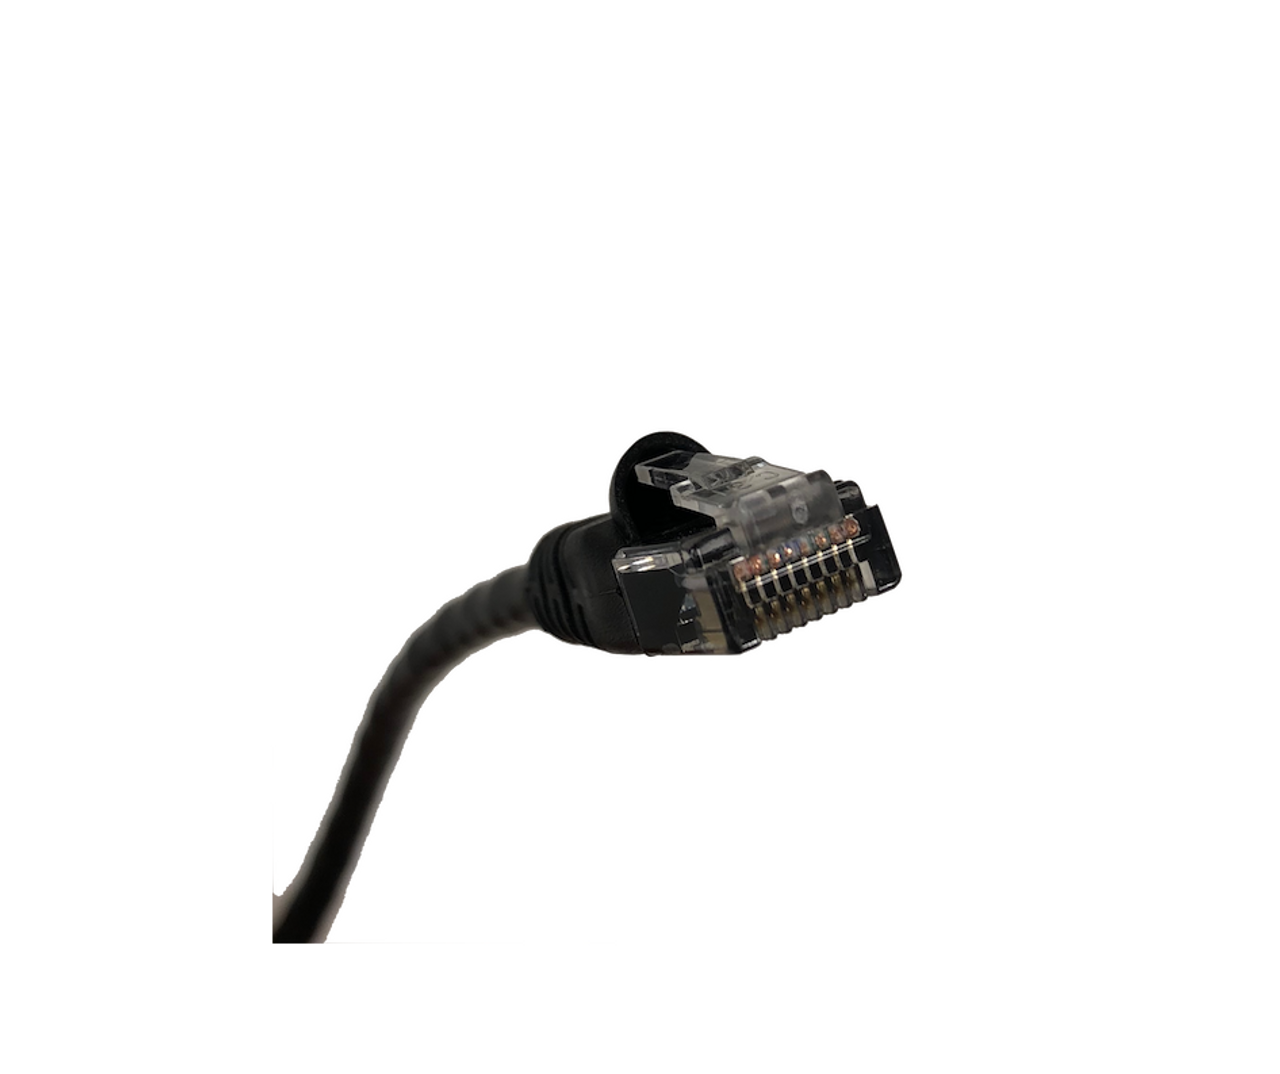 Category 5E UTP RJ45 Patch Cable Black - 10 ft